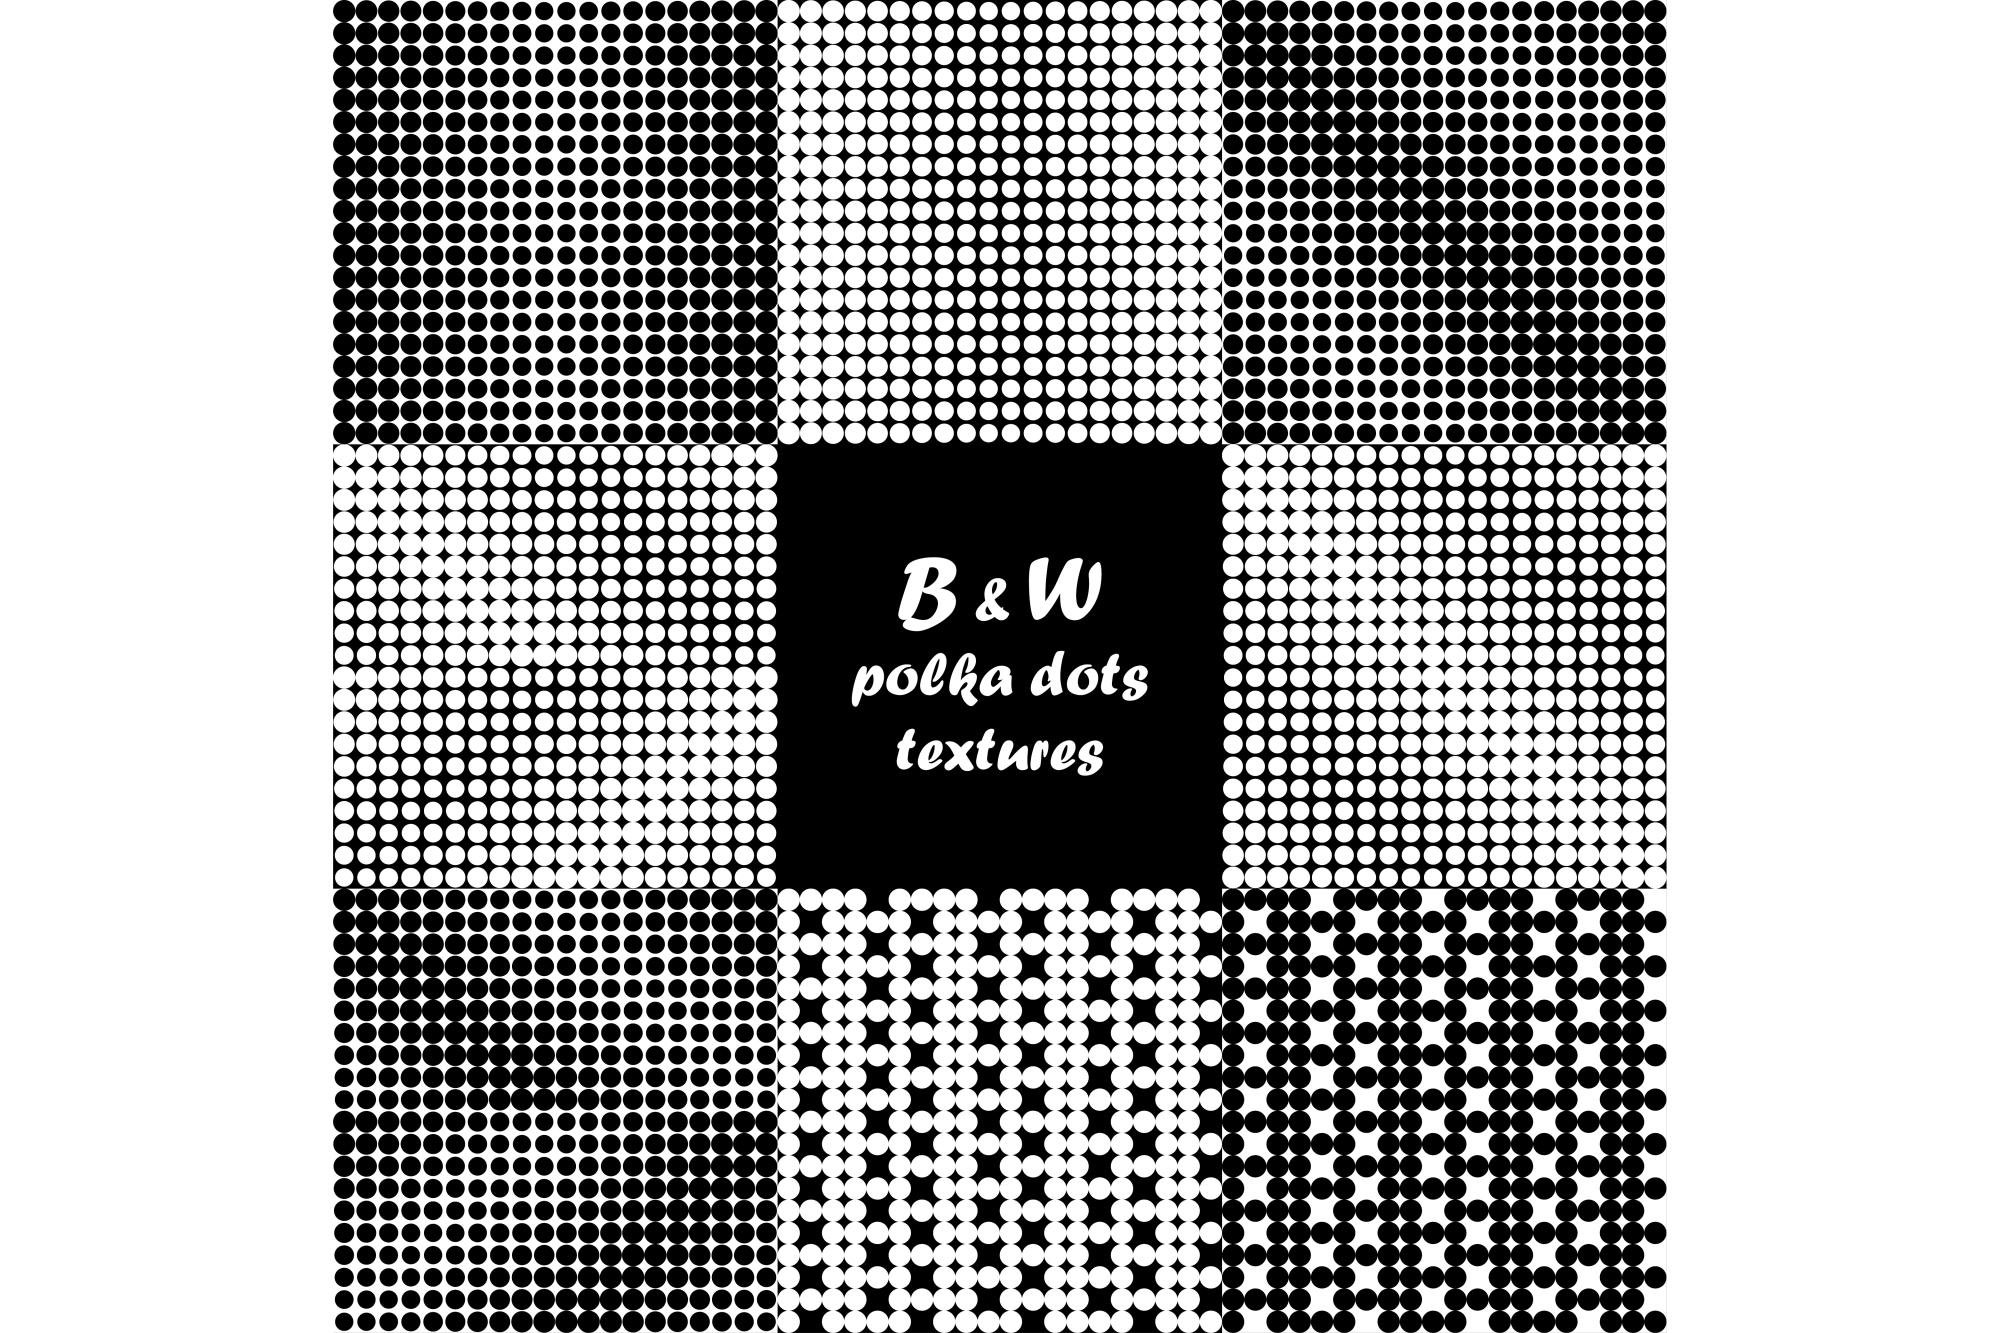 Set of 9 seamless black and white polka dot pattern.  example image 1